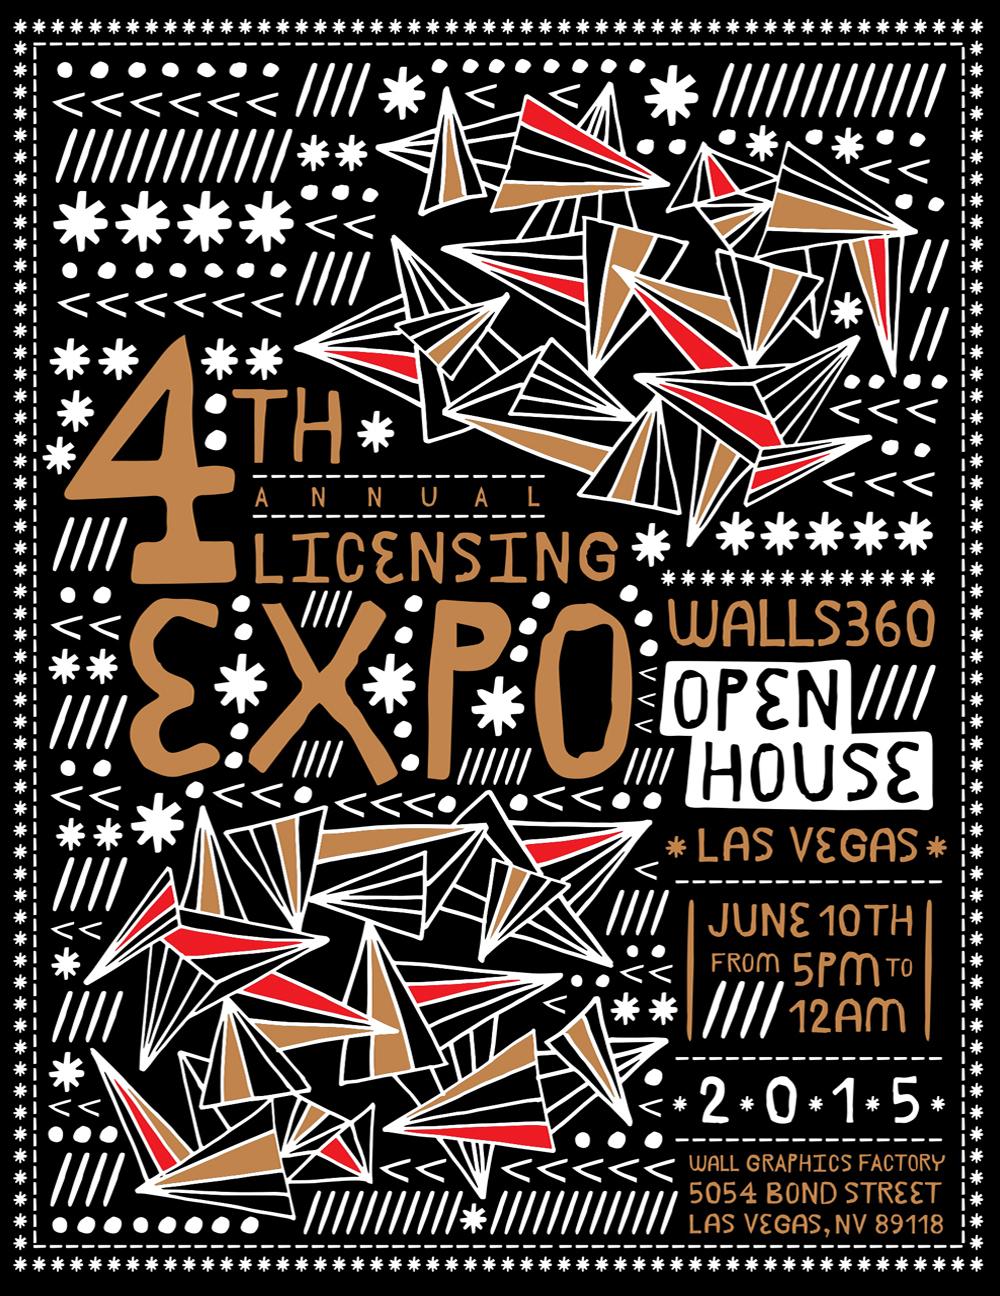 http://blog.walls360.com/walls360-open-house-licensing15/